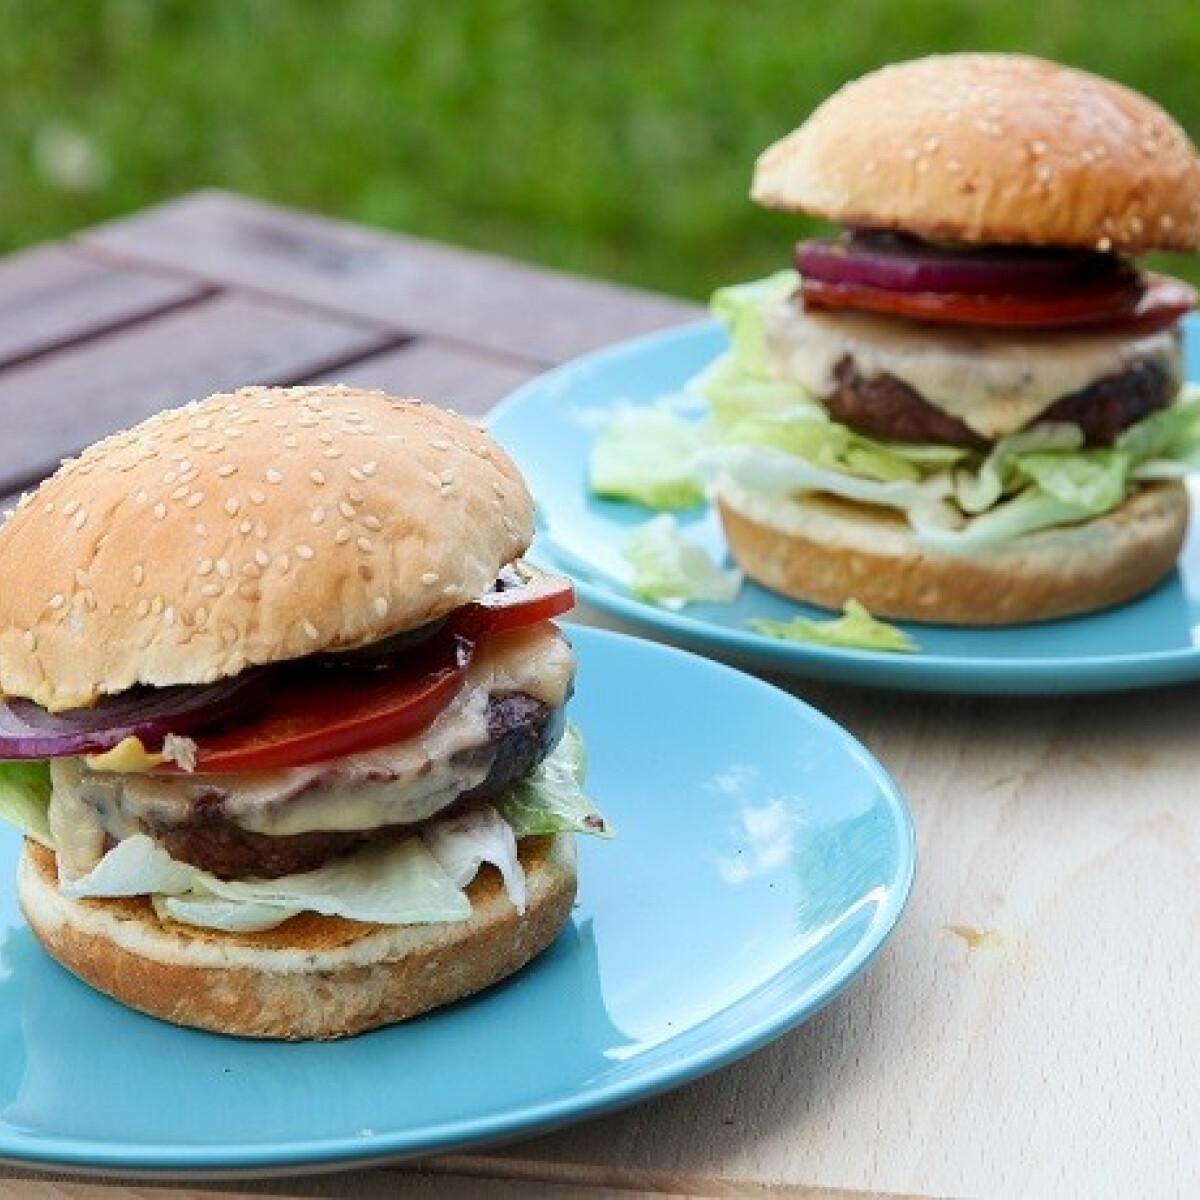 Ezen a képen: Hamburger